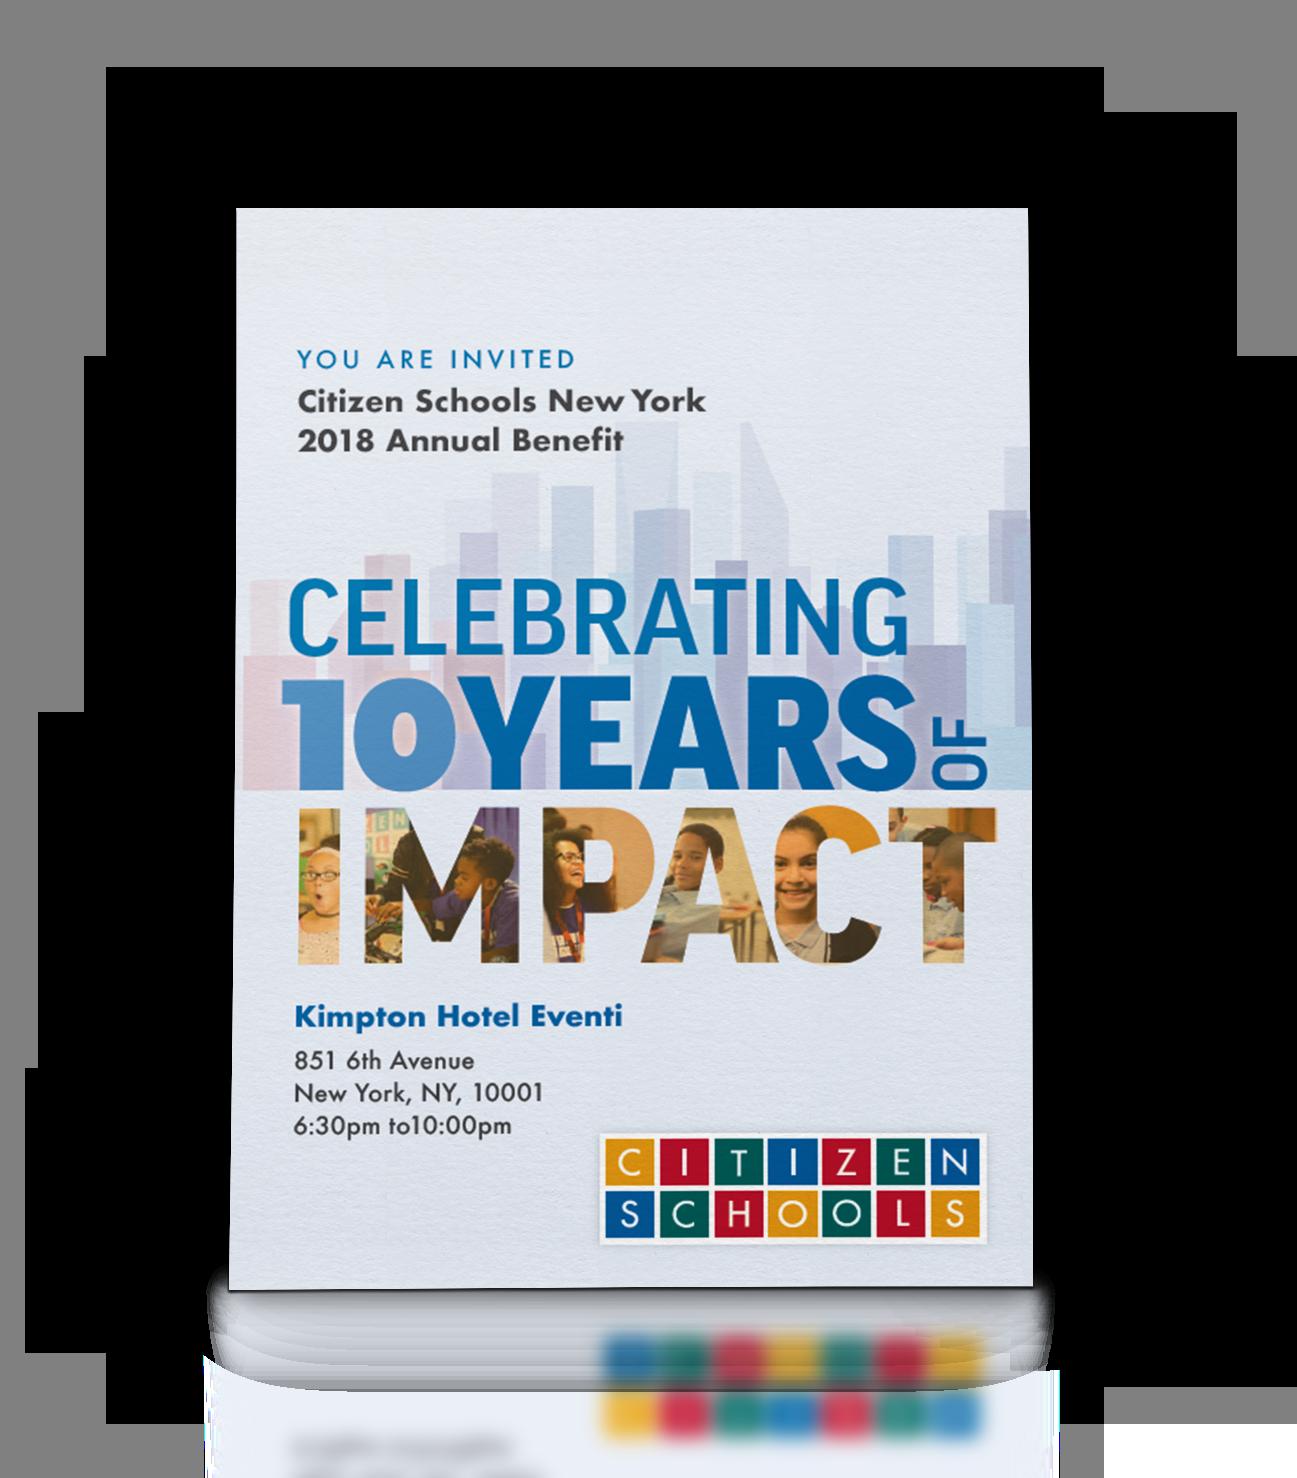 Copy of Event invite for an education non-profit